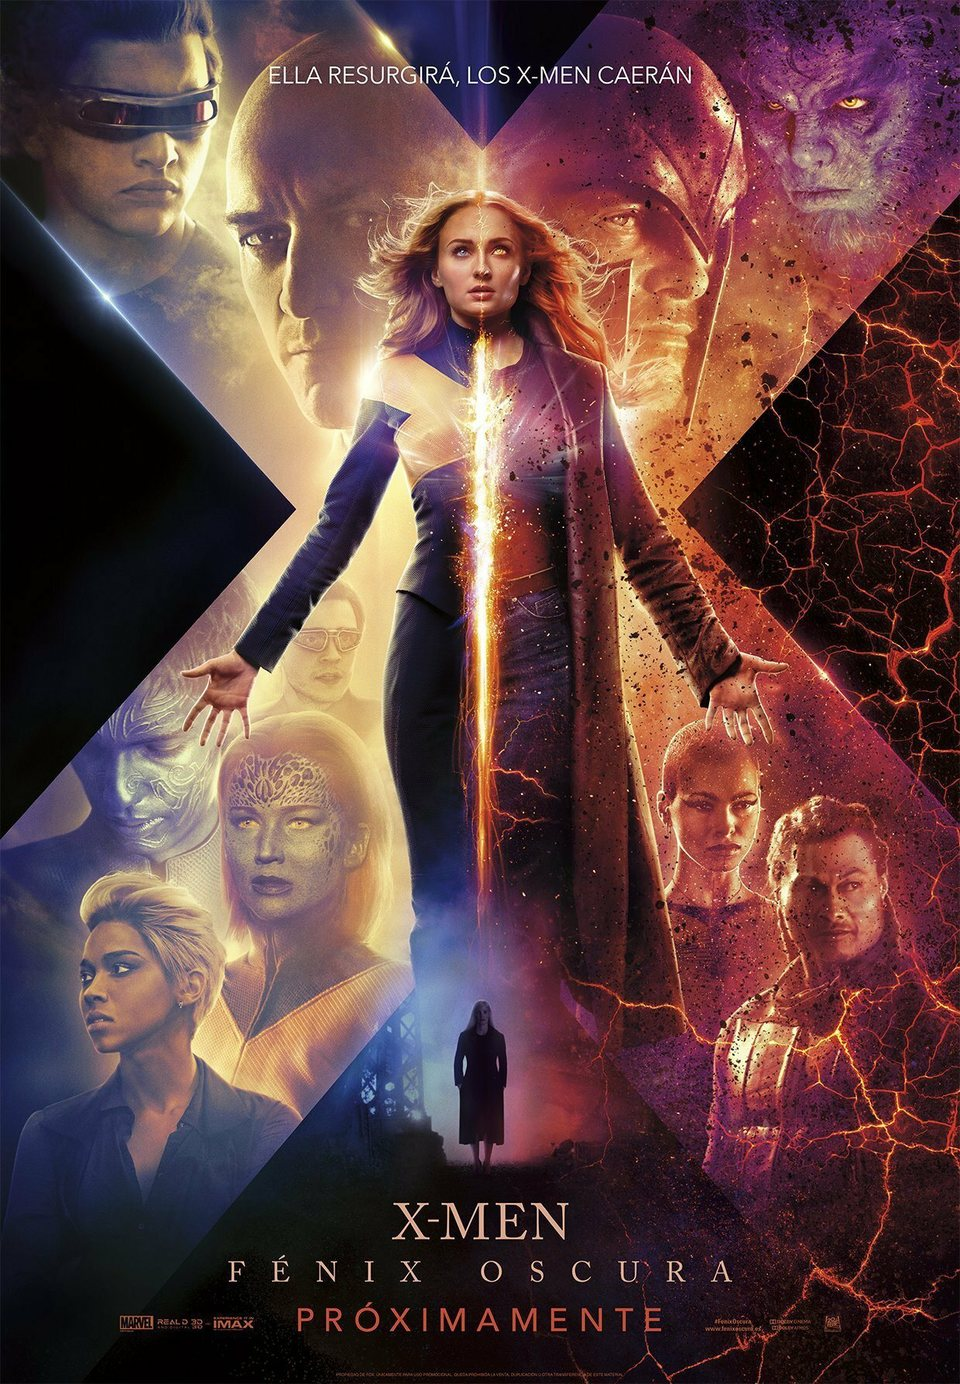 Cartel Poster Espanol De X Men Fenix Oscura 2019 Ecartelera Peliculas Completas Peliculas Completas Gratis Ver Peliculas Online